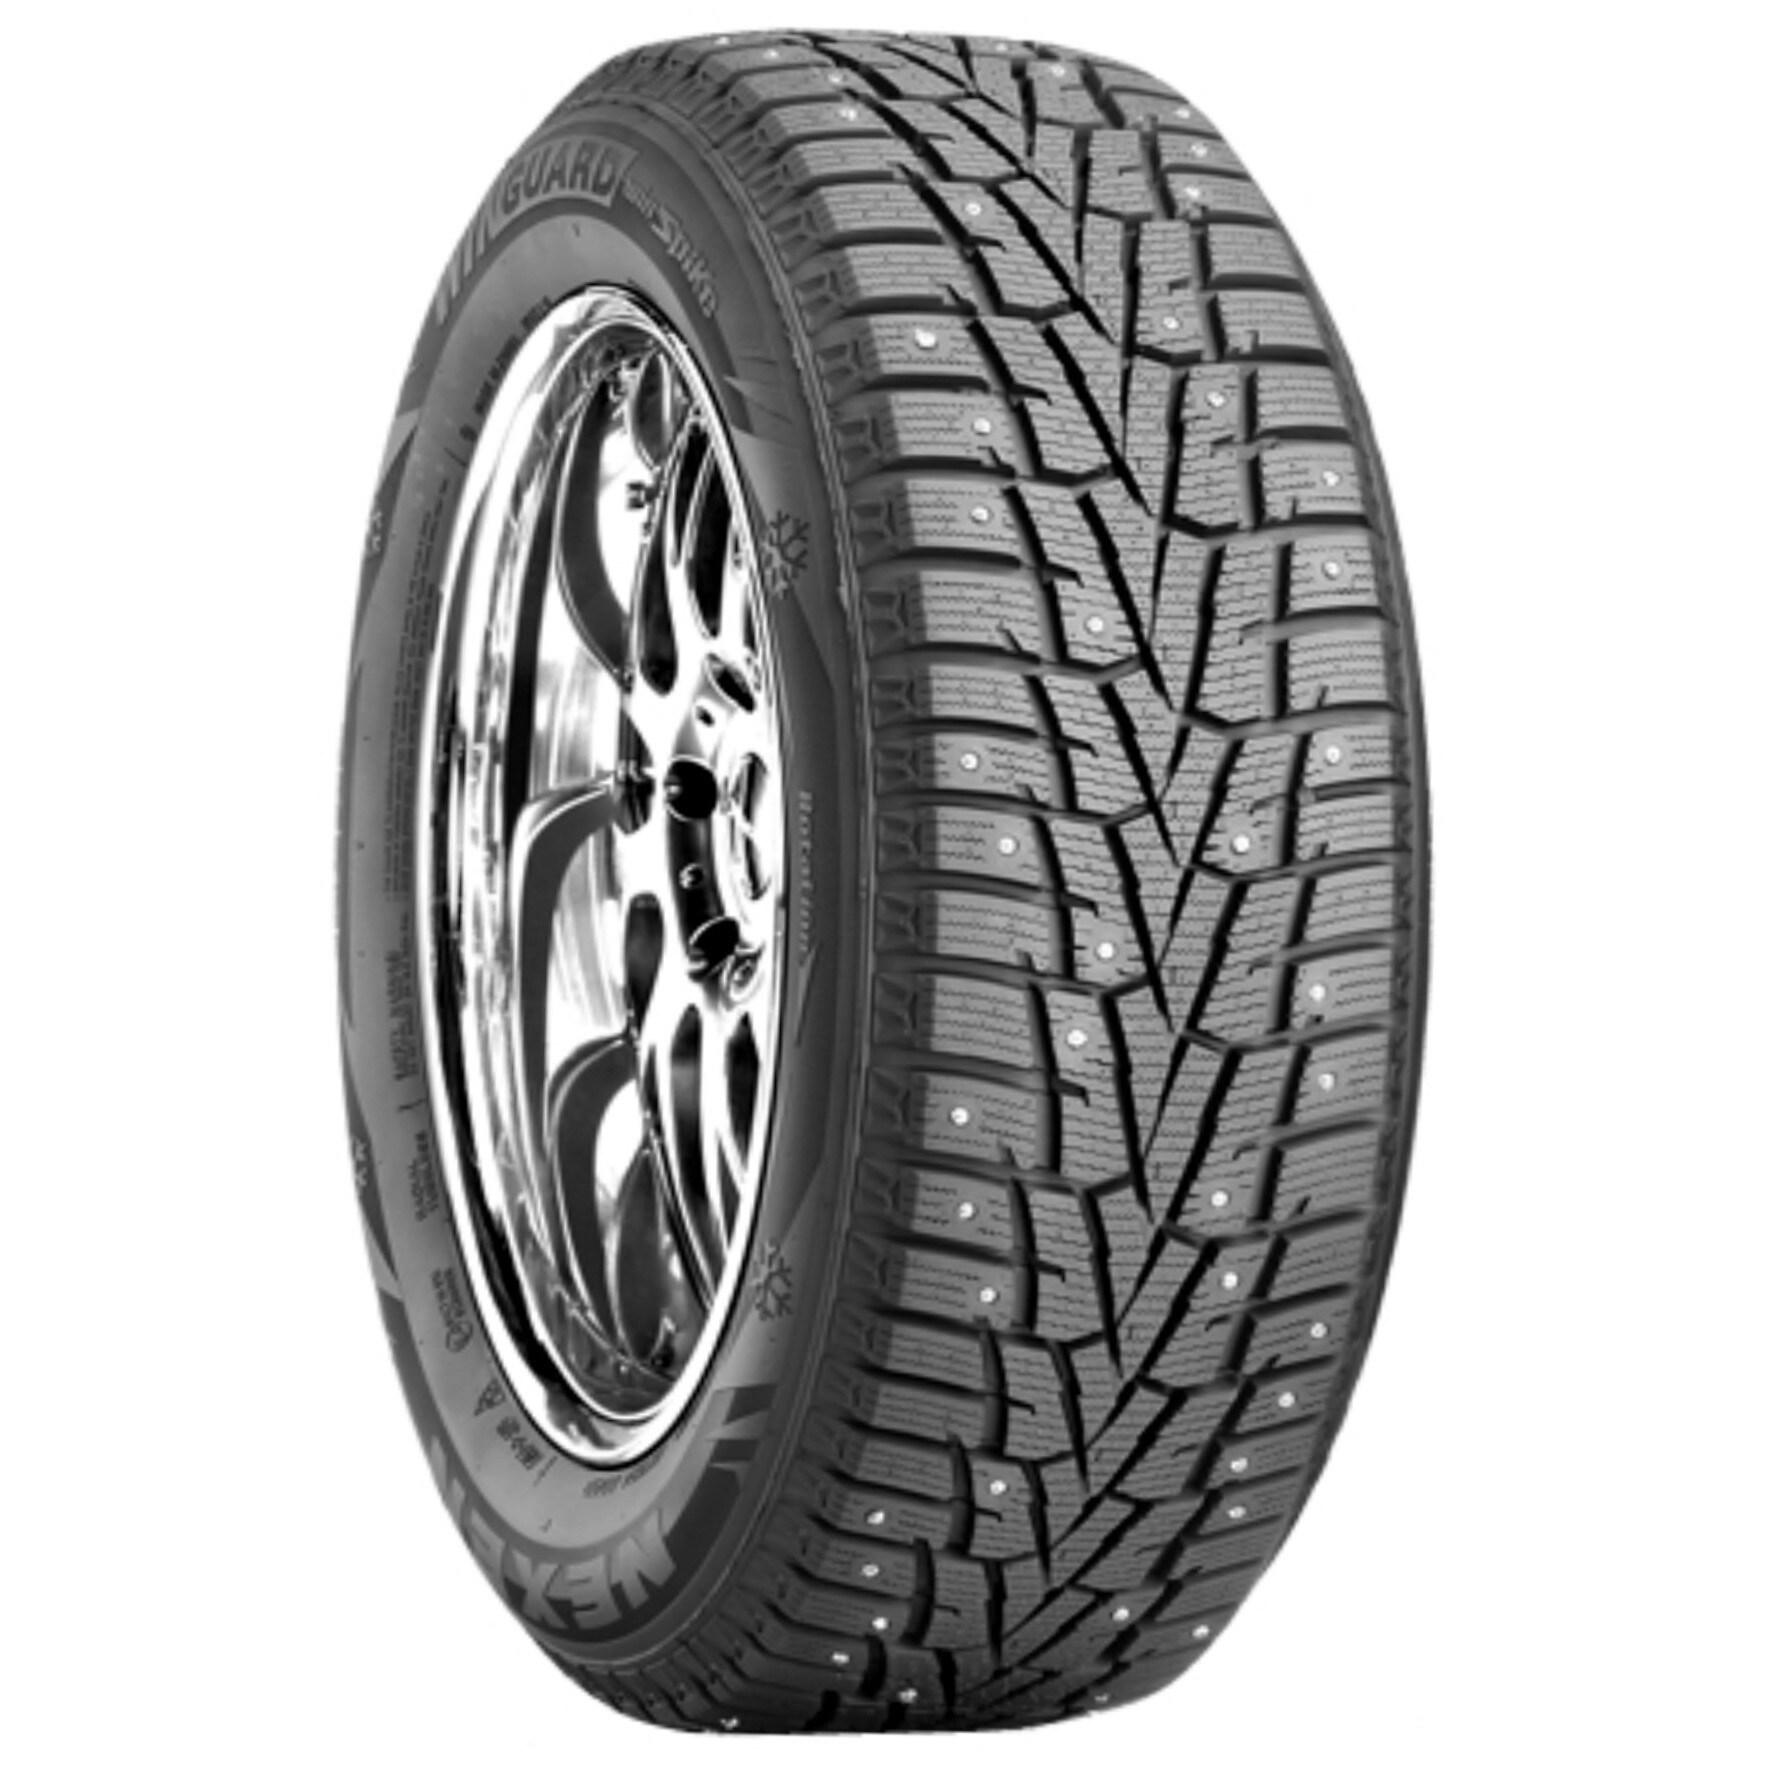 Nexen Winguard Winspike Winter Tire - 195/60R15 92T (Black)